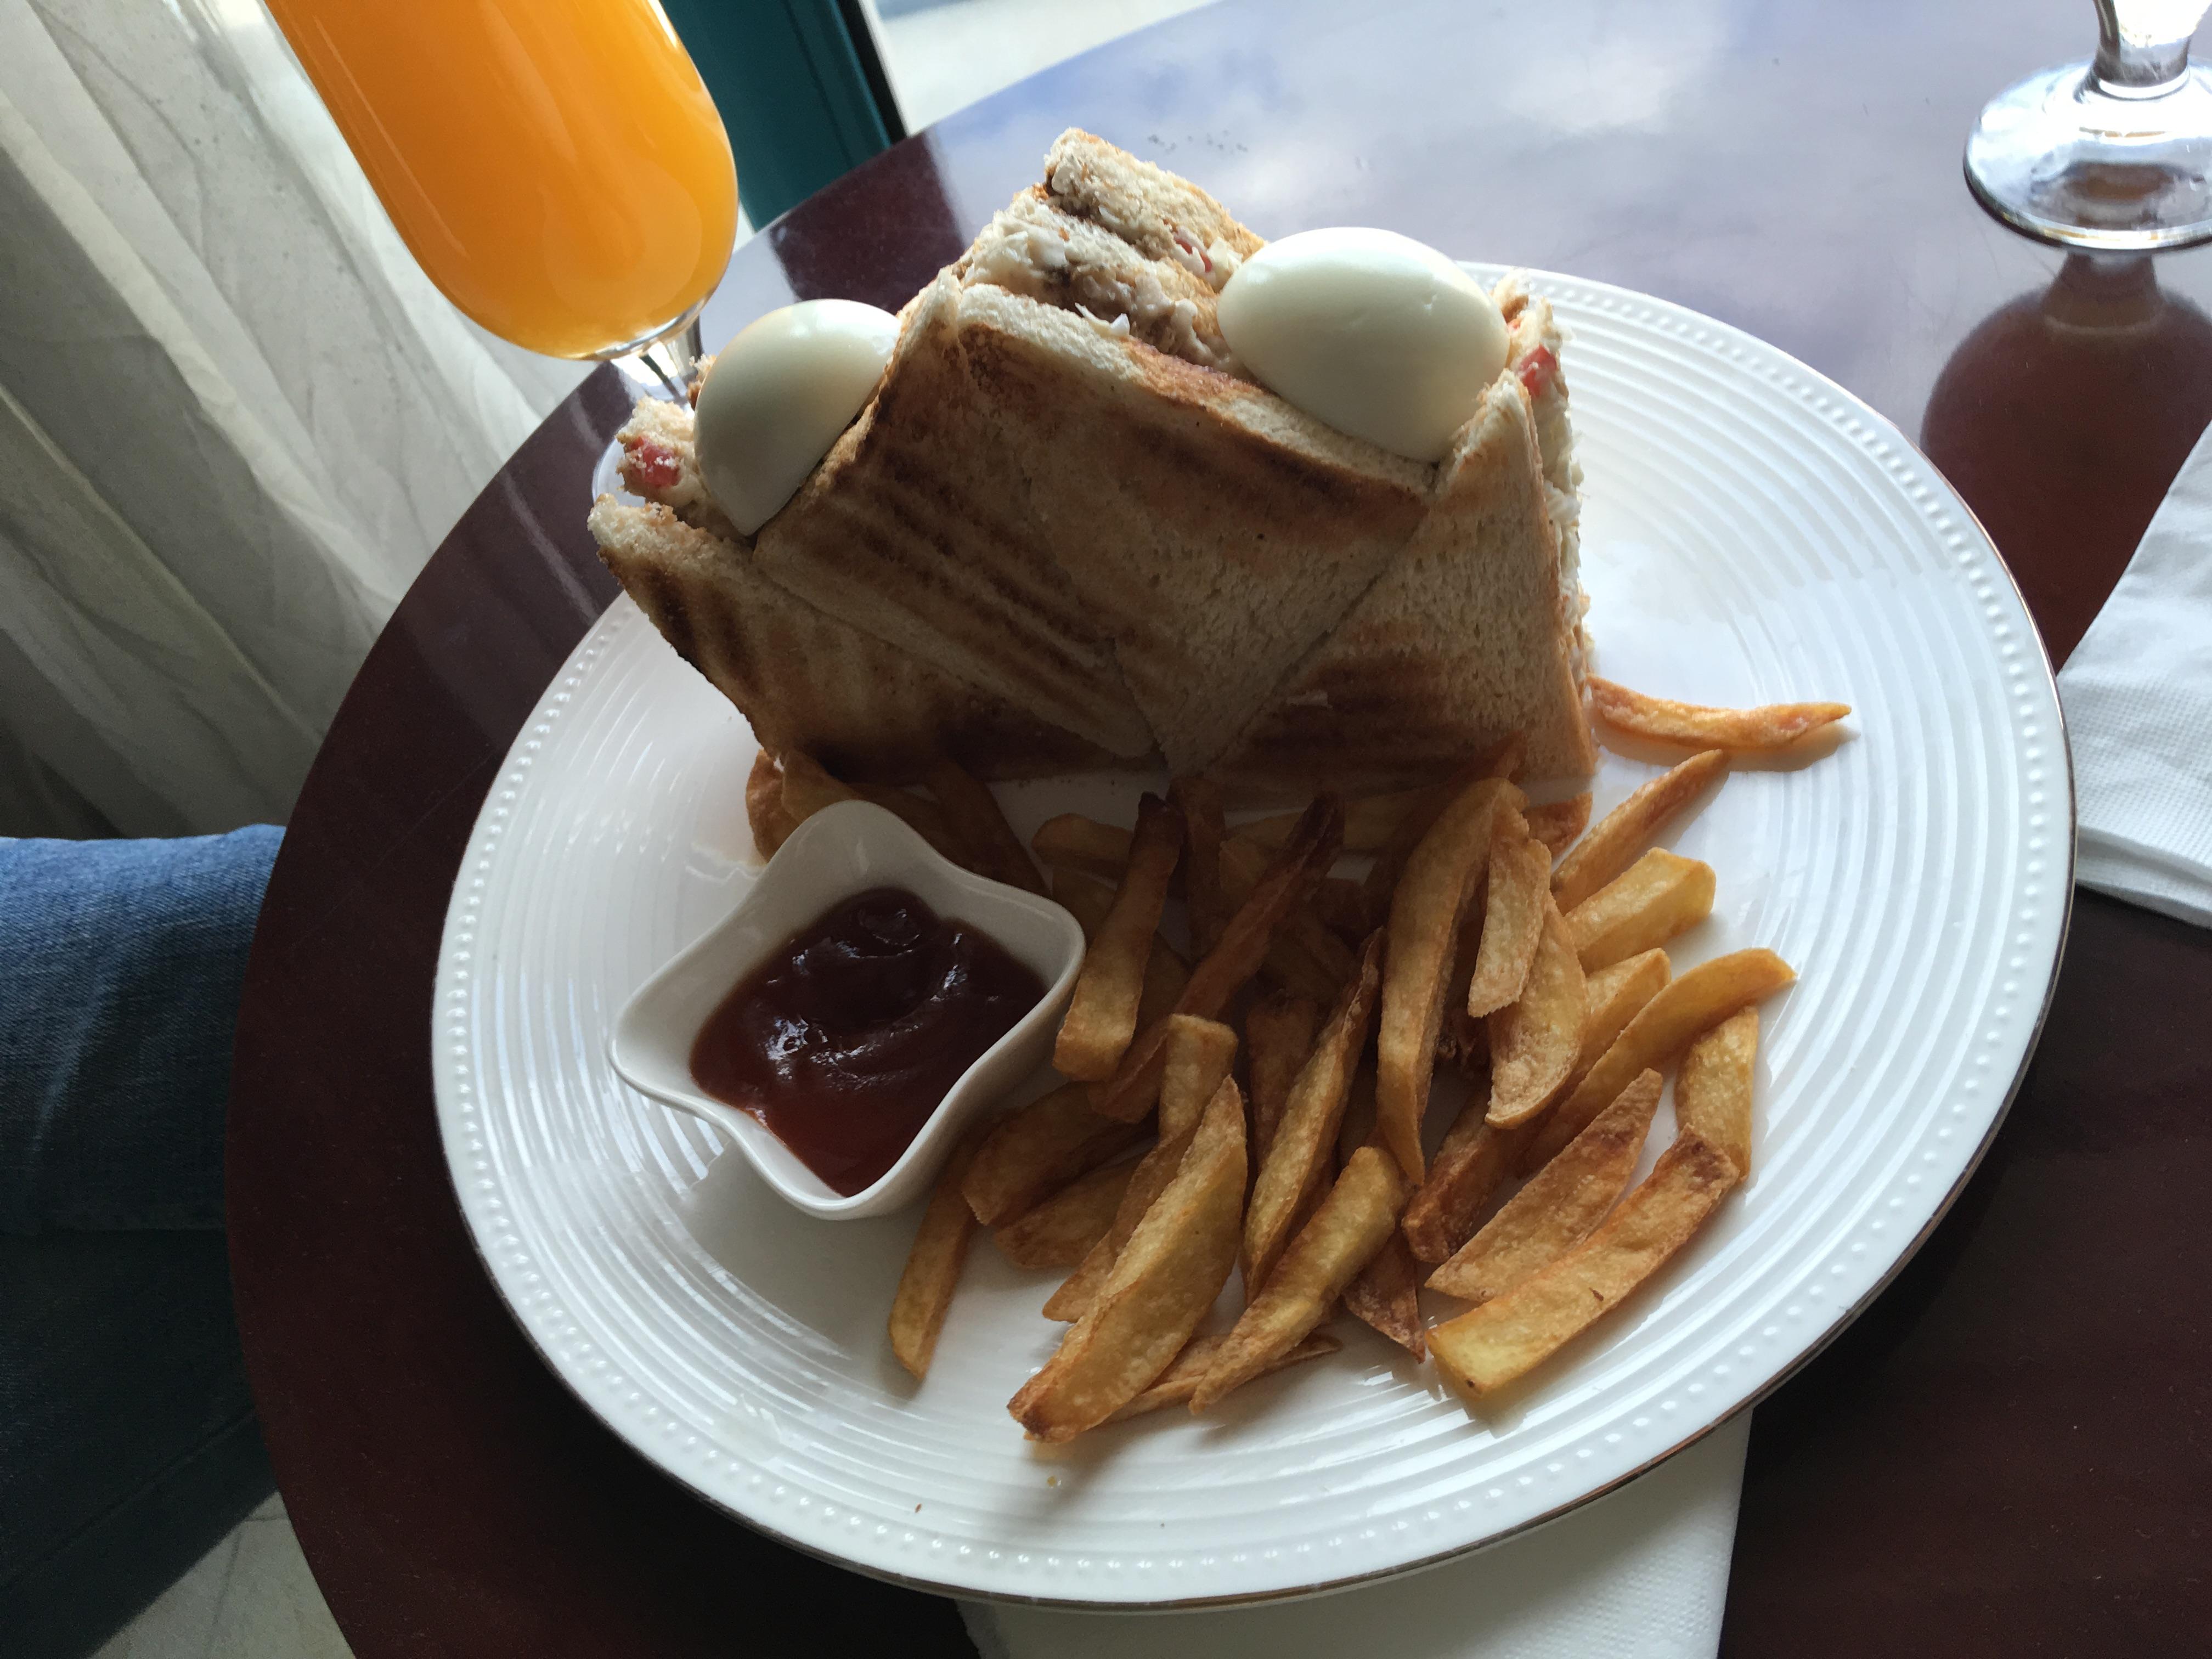 https://foodloader.net/blub_2018-01-03_Club_Sandwich_mit_Pommes.jpg